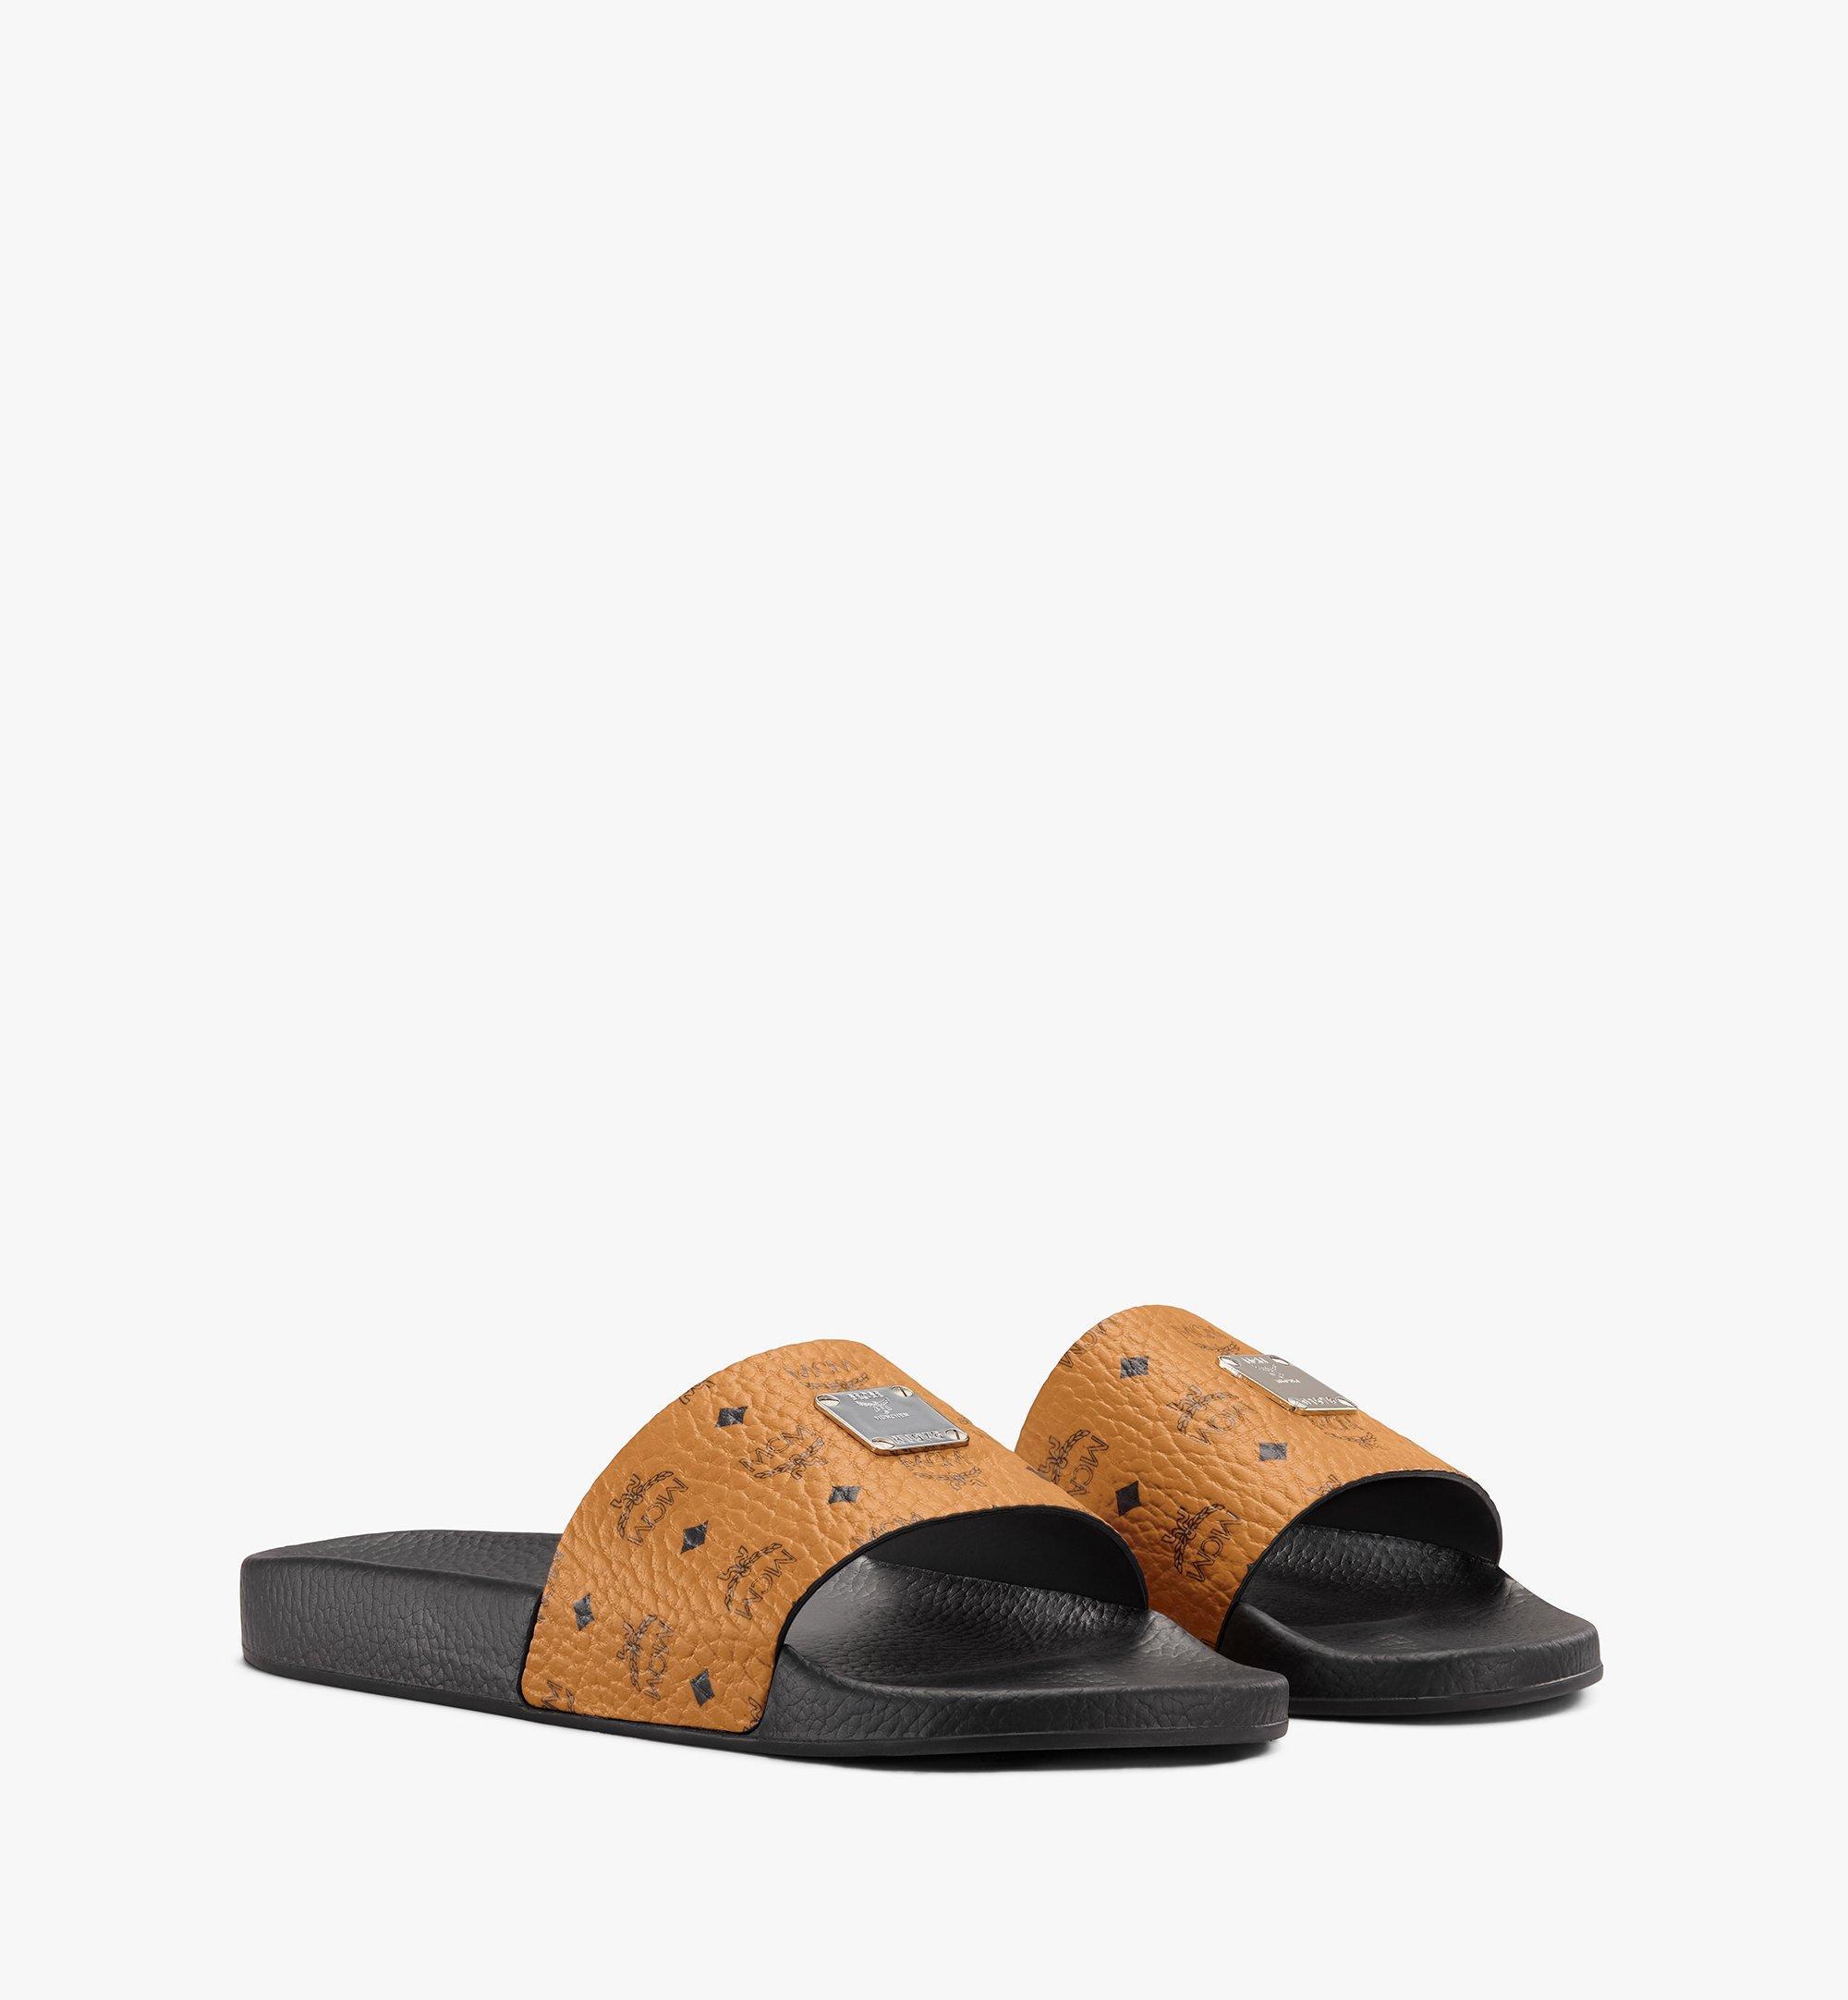 MCM Men's Visetos Slides  - Cognac - Size: 043